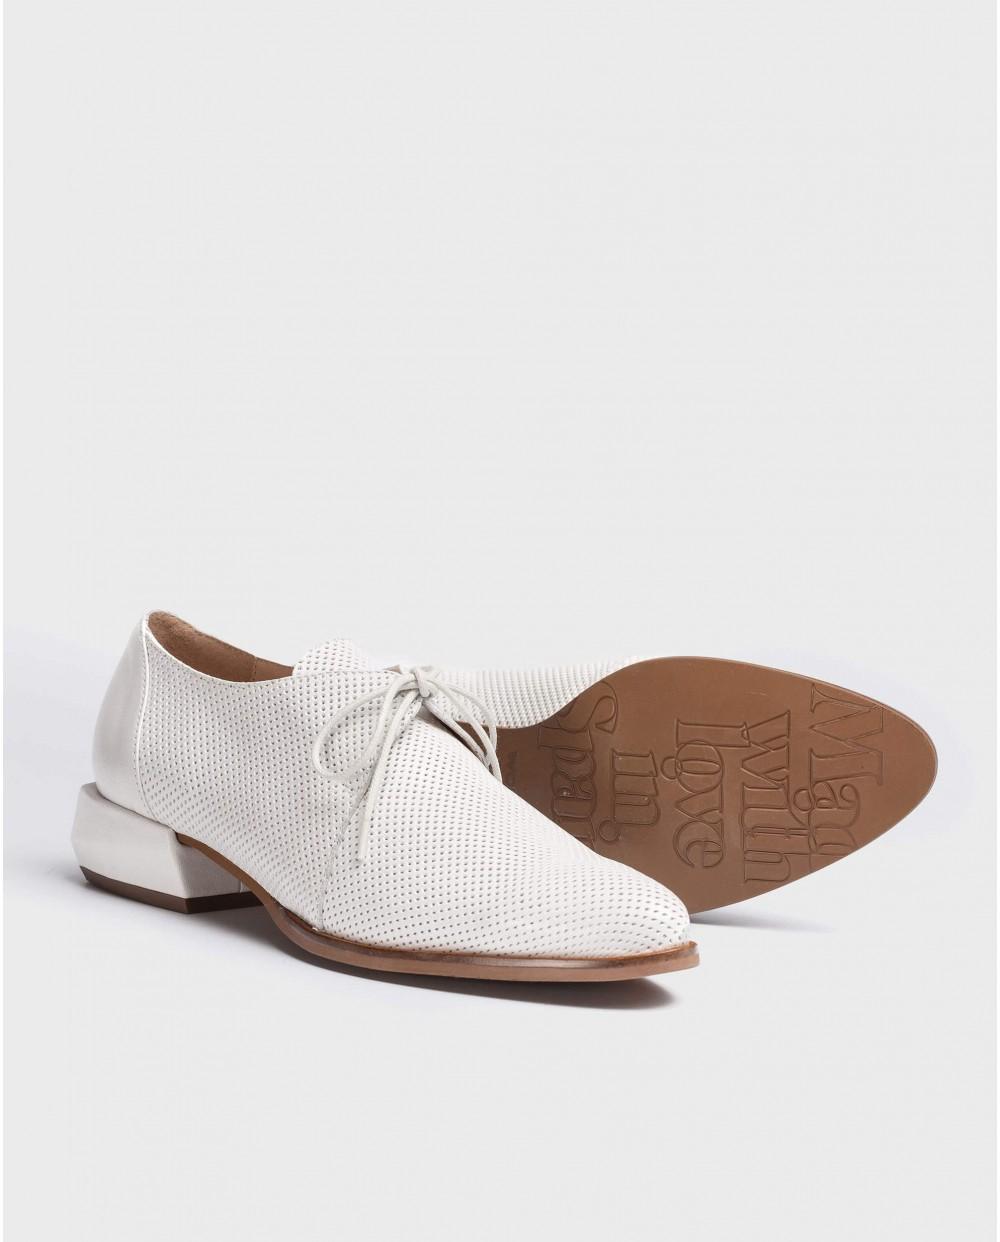 Wonders-Flat Shoes-Shoe with geometric heel